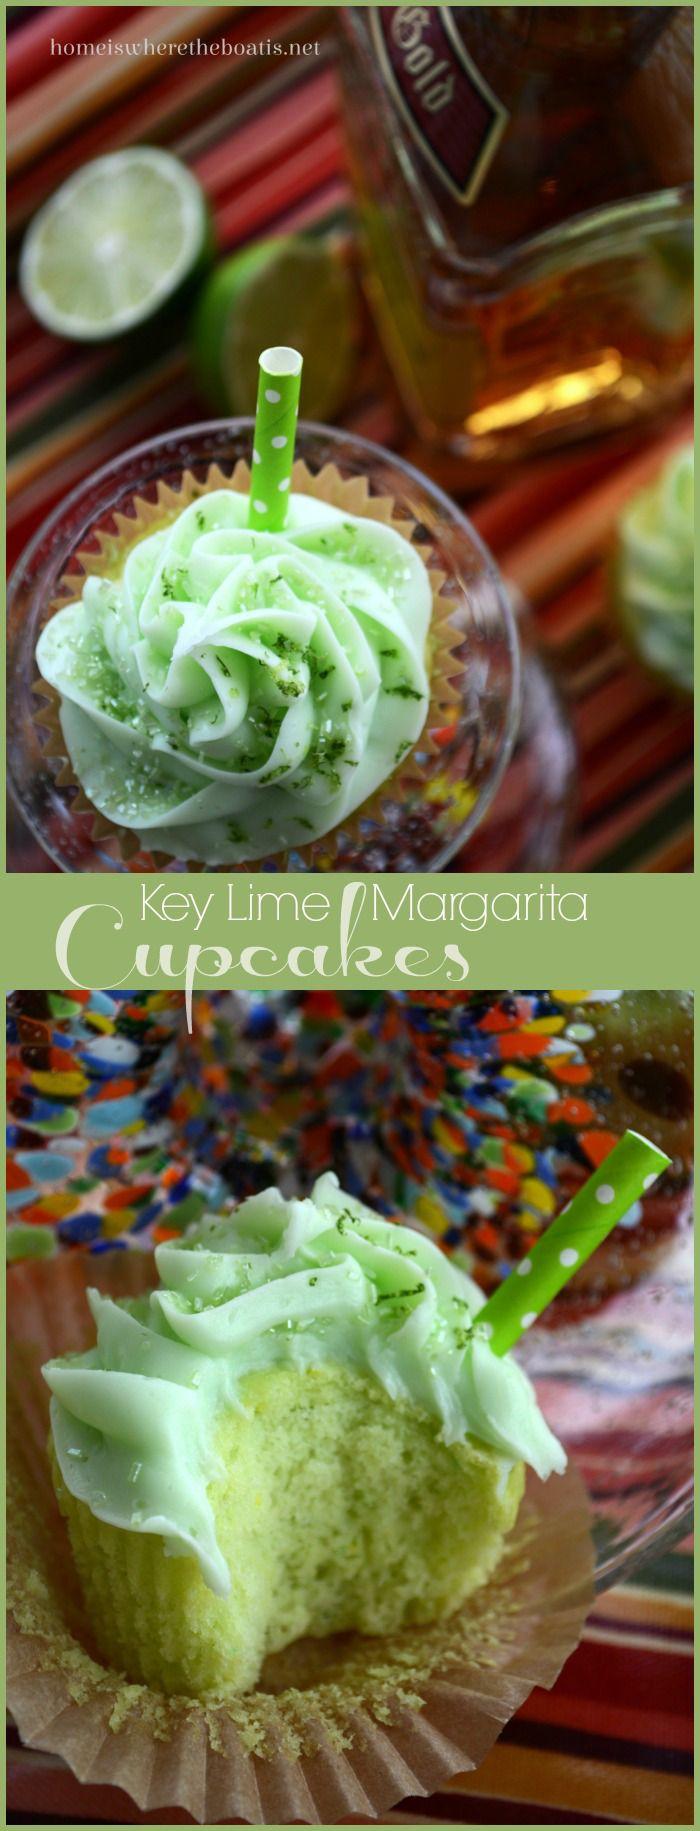 Key Lime Margarita Cupcakes | homeiswheretheboatis.net #CincodeMayo #cupcakes